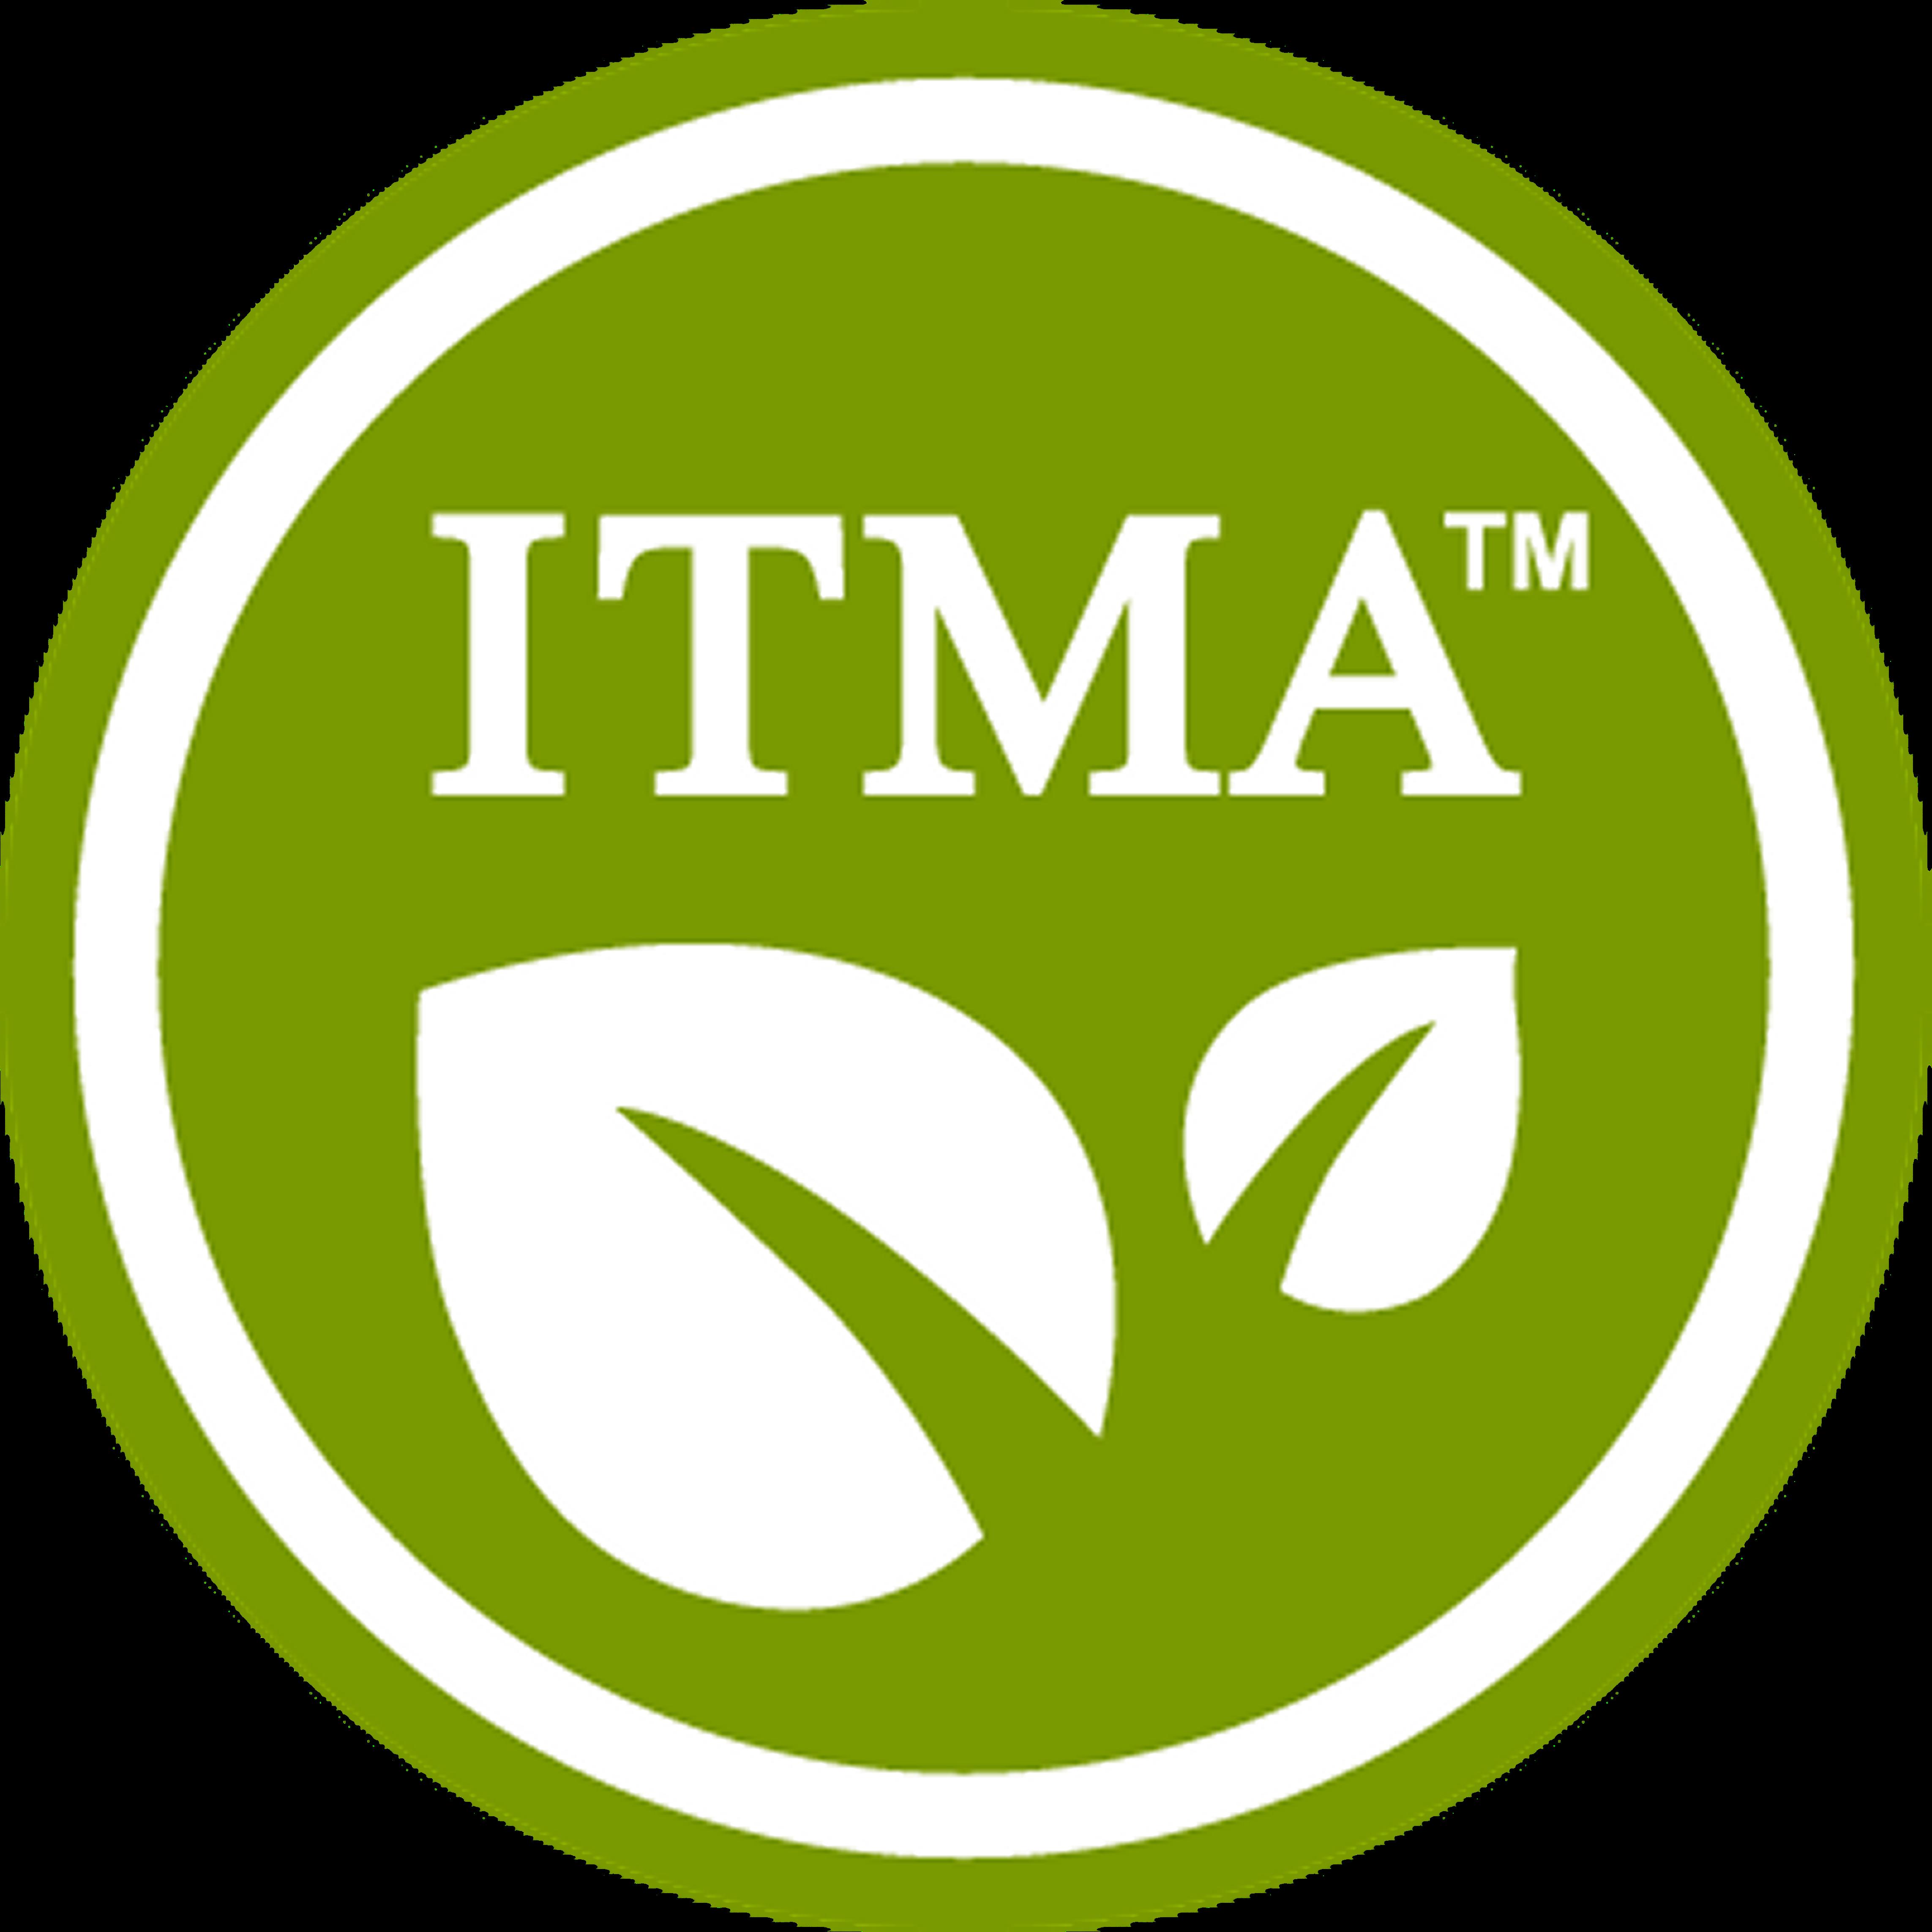 ITMA_symbol_RGB 6×6 300dpi[988]